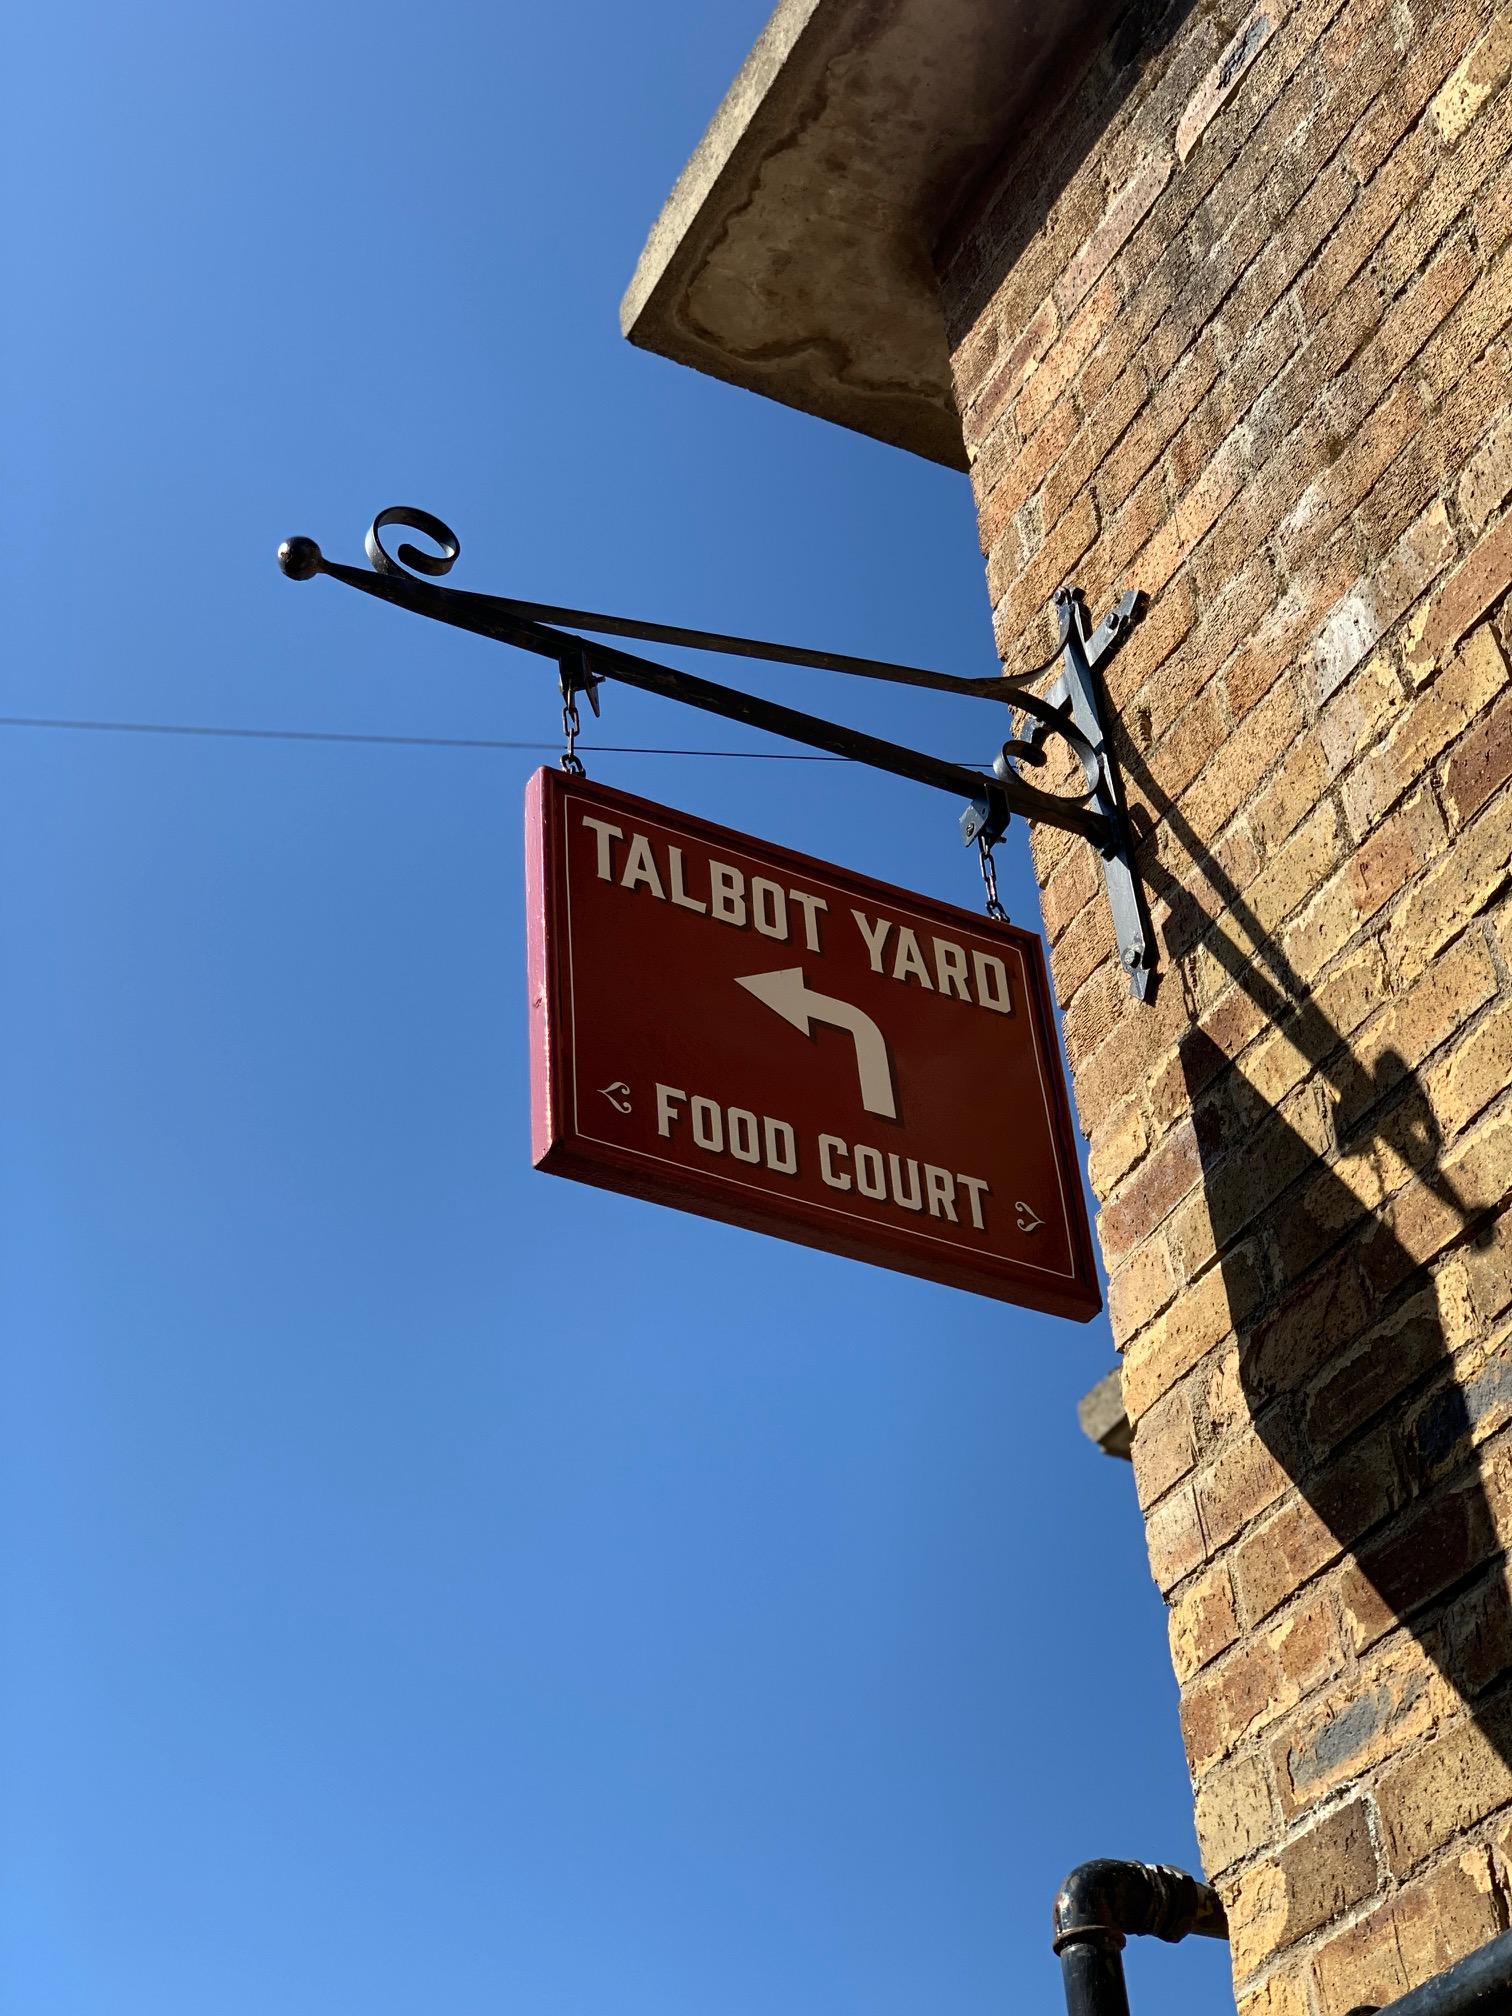 Talbot Yard Food Court